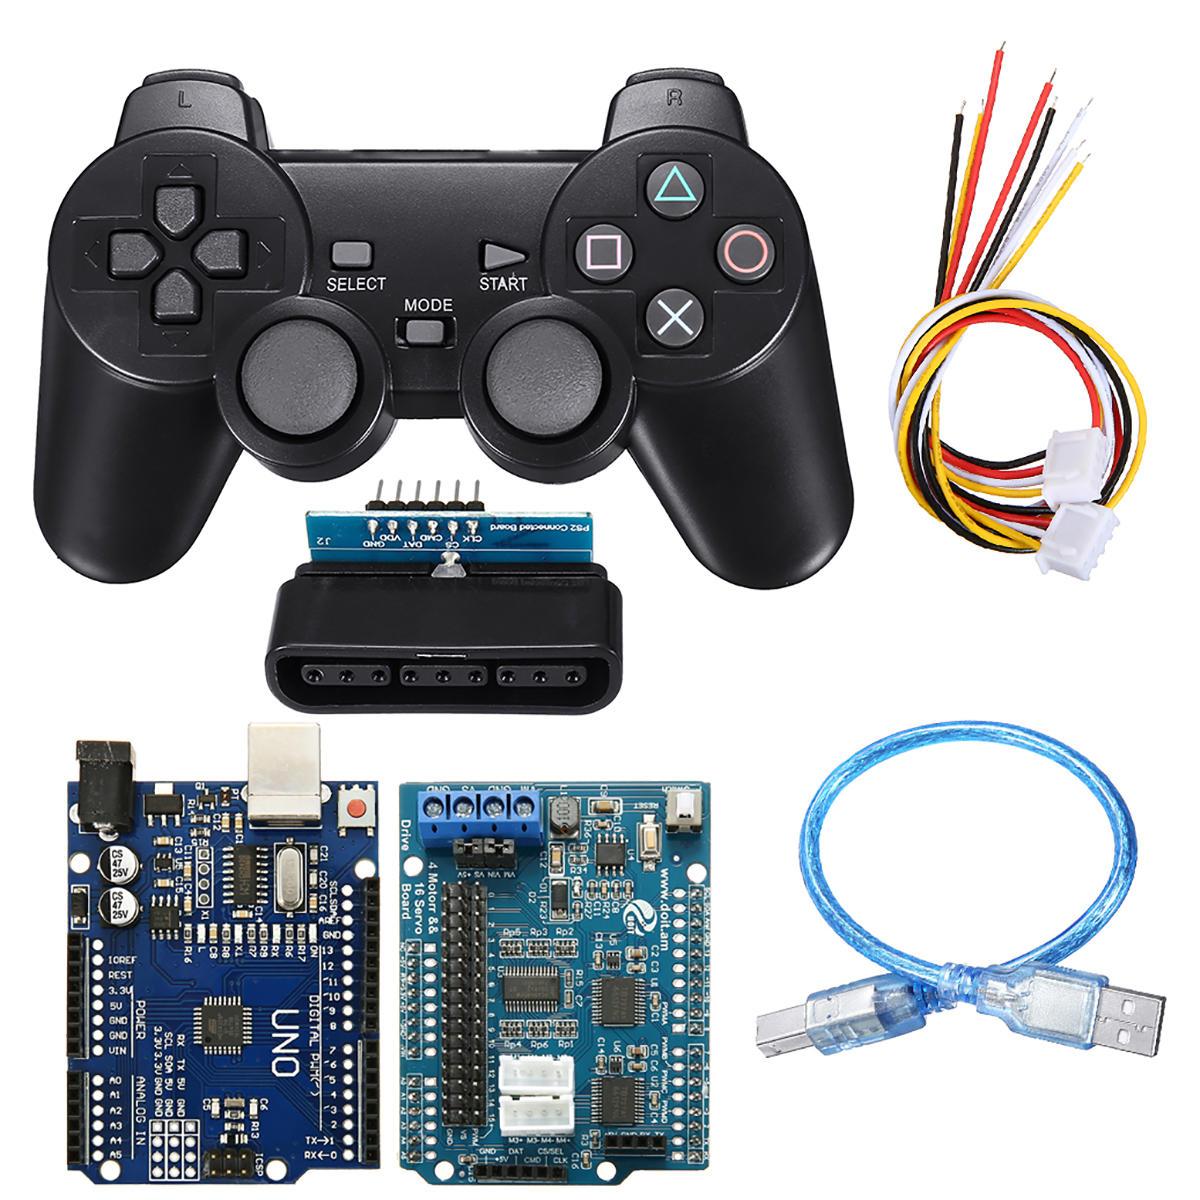 WiFi bluetooth Handle DIY Remote Control Smart Car Module Kit For Arduino  Motor Servo Drive Arm